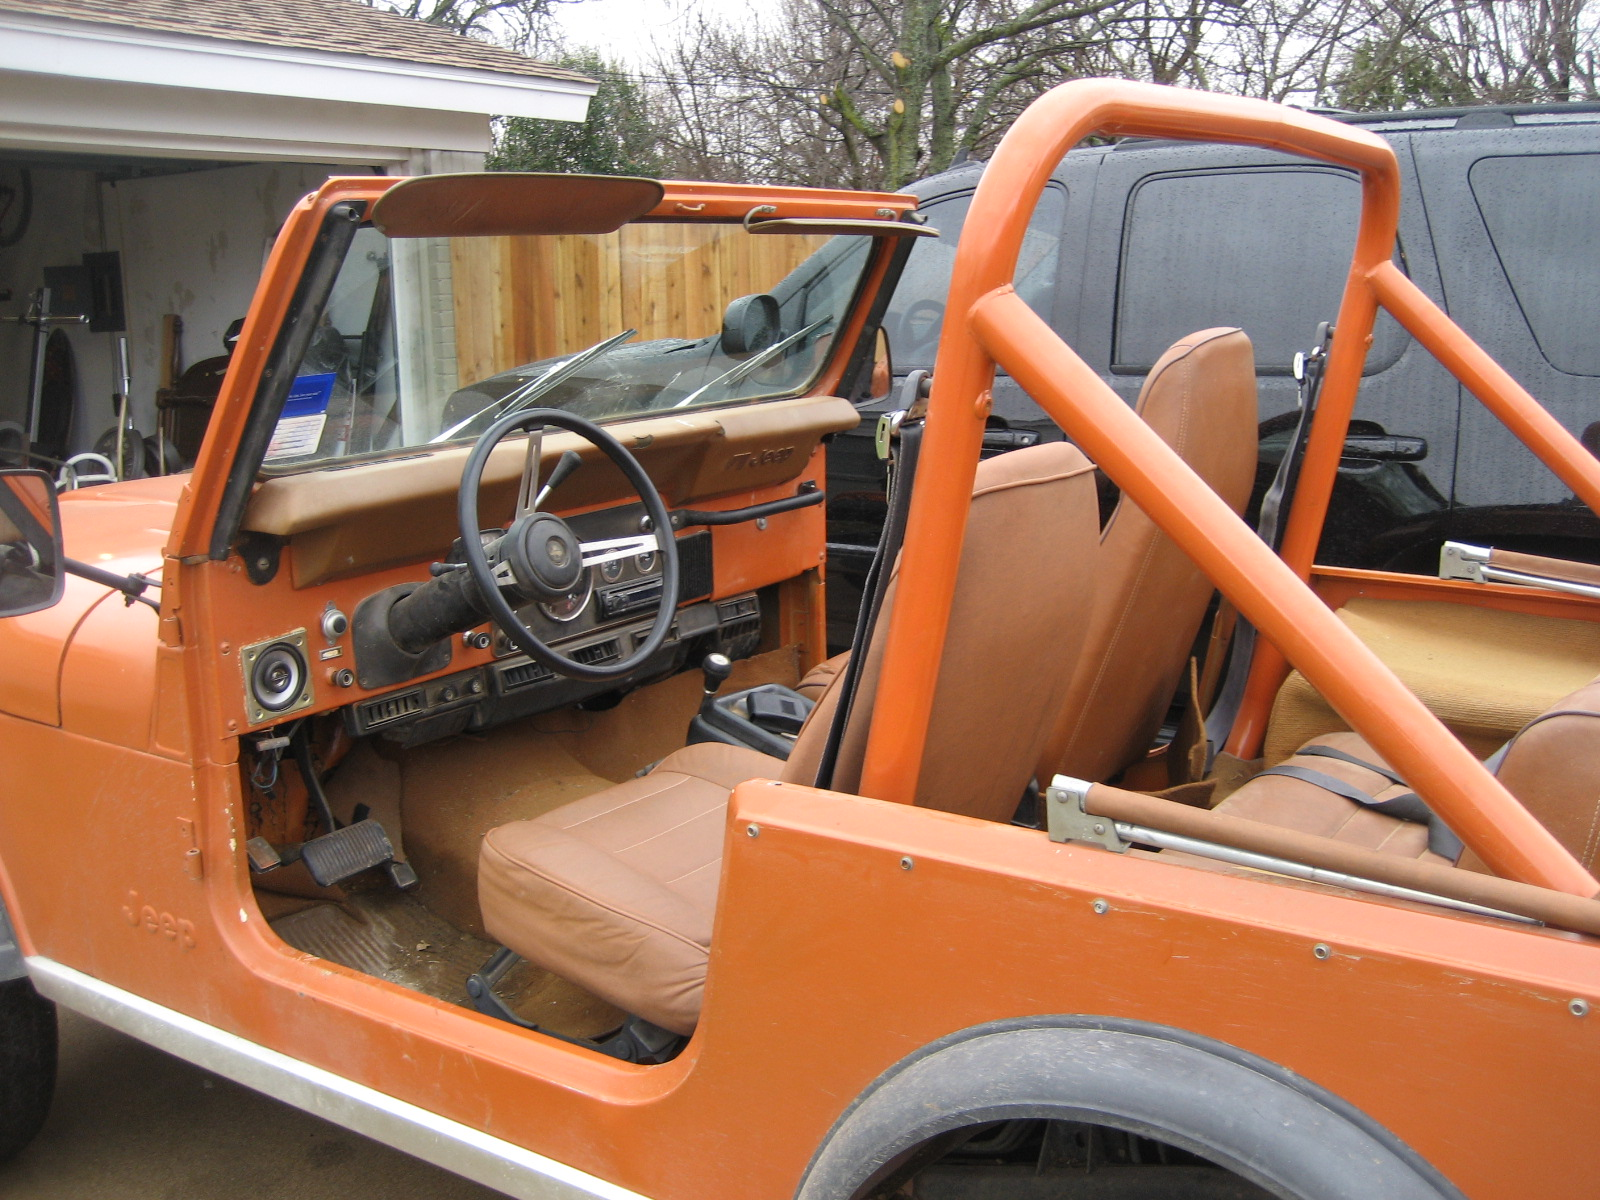 Jeep_0032.jpg